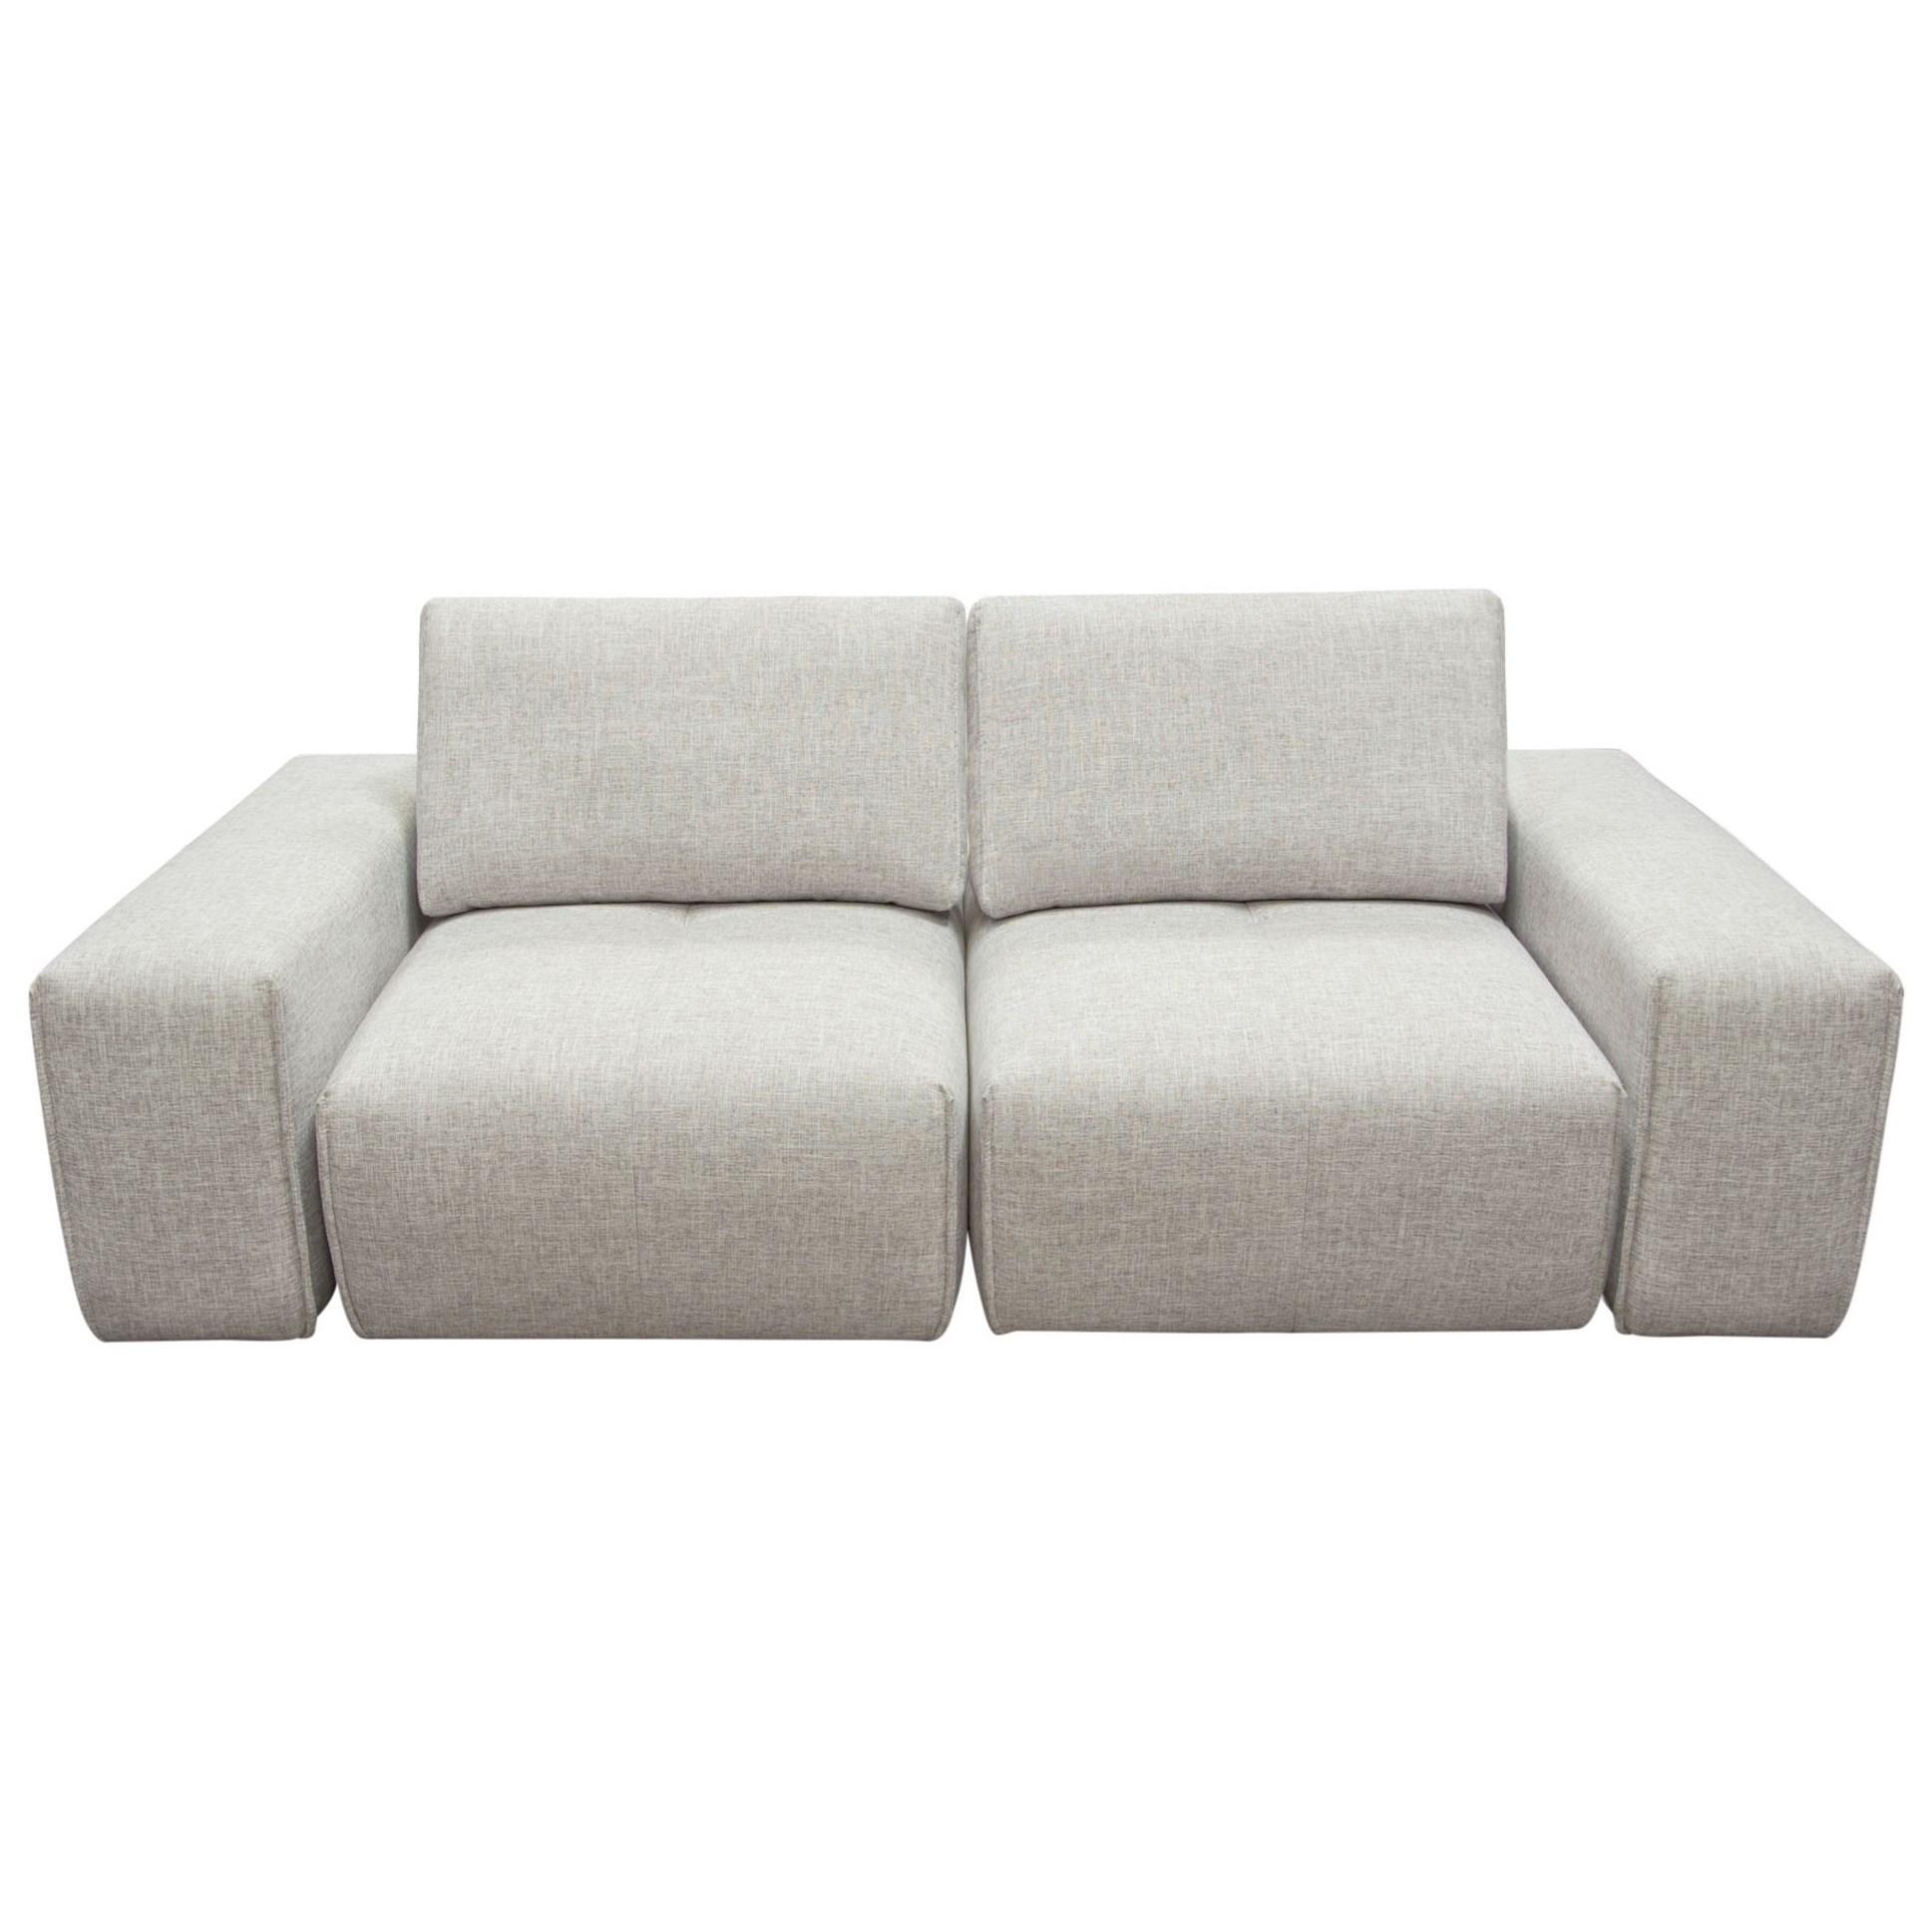 Delicieux Diamond Sofa JazzLoveseat ...